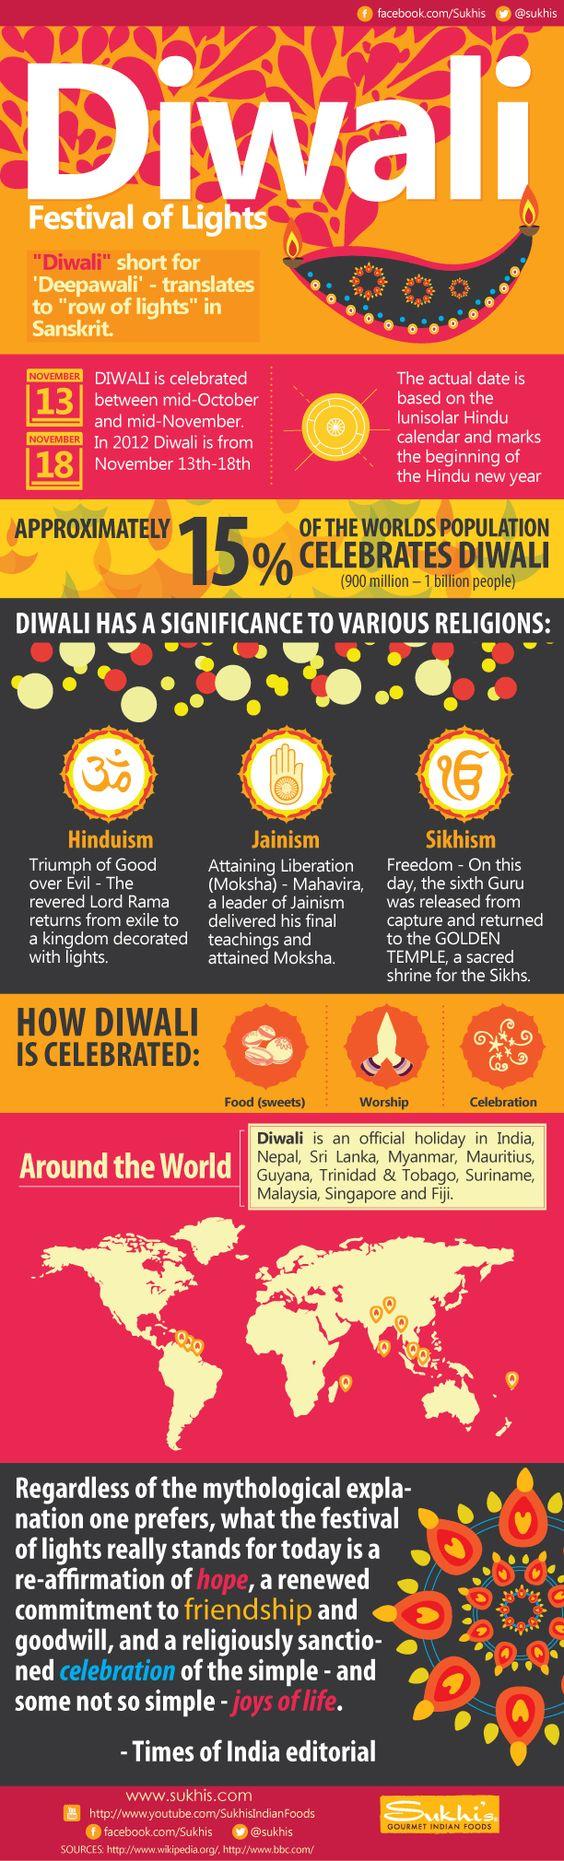 diwali-infographic